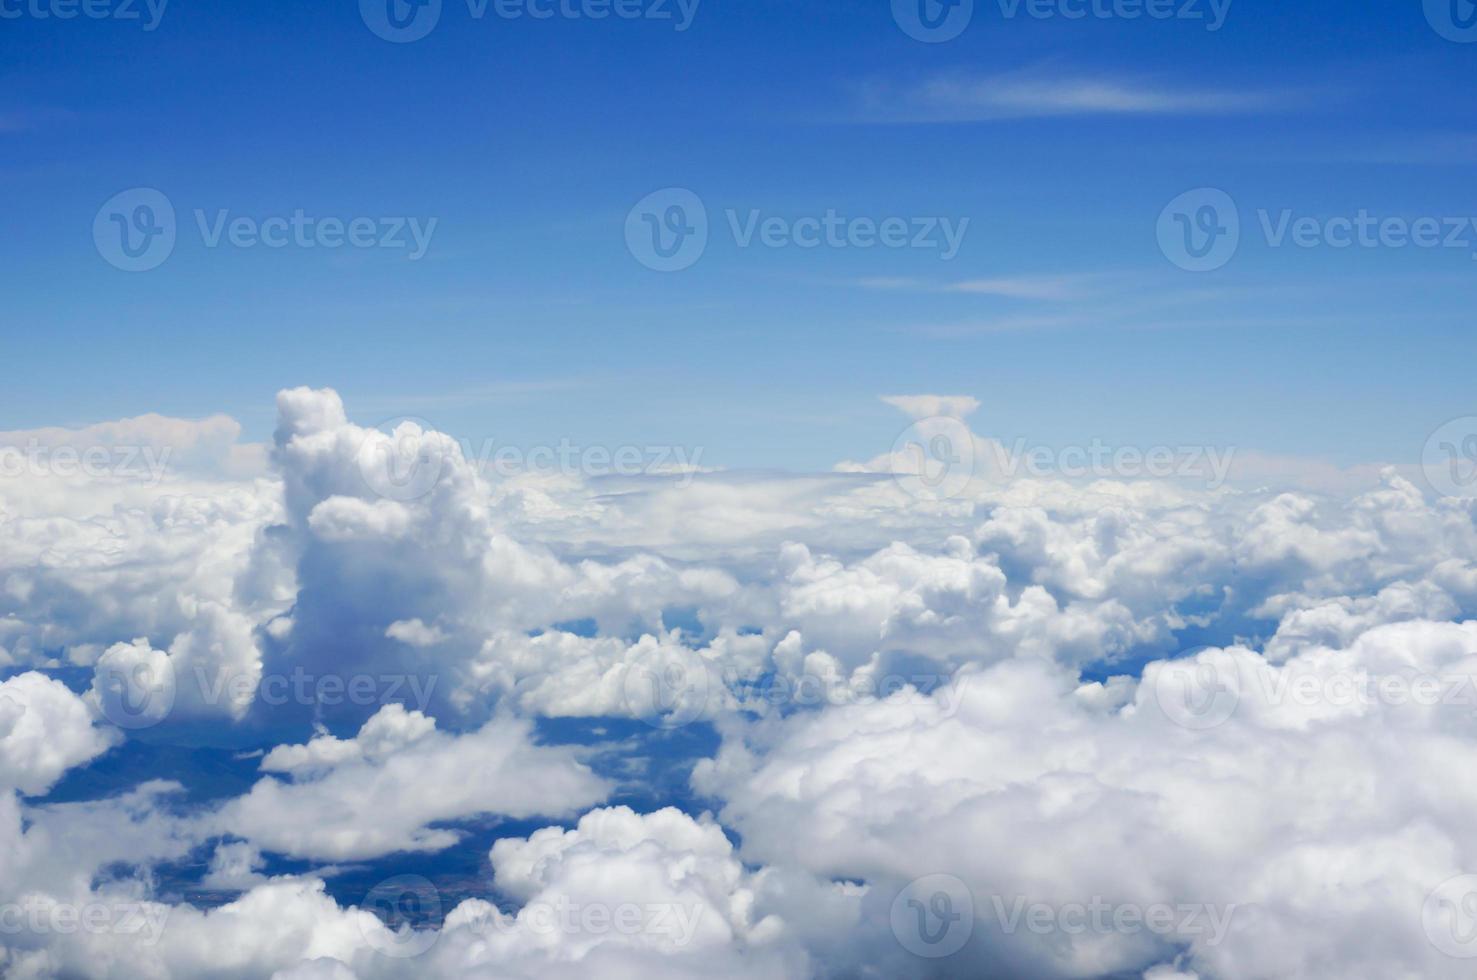 nuvola e cielo dall'aereo foto